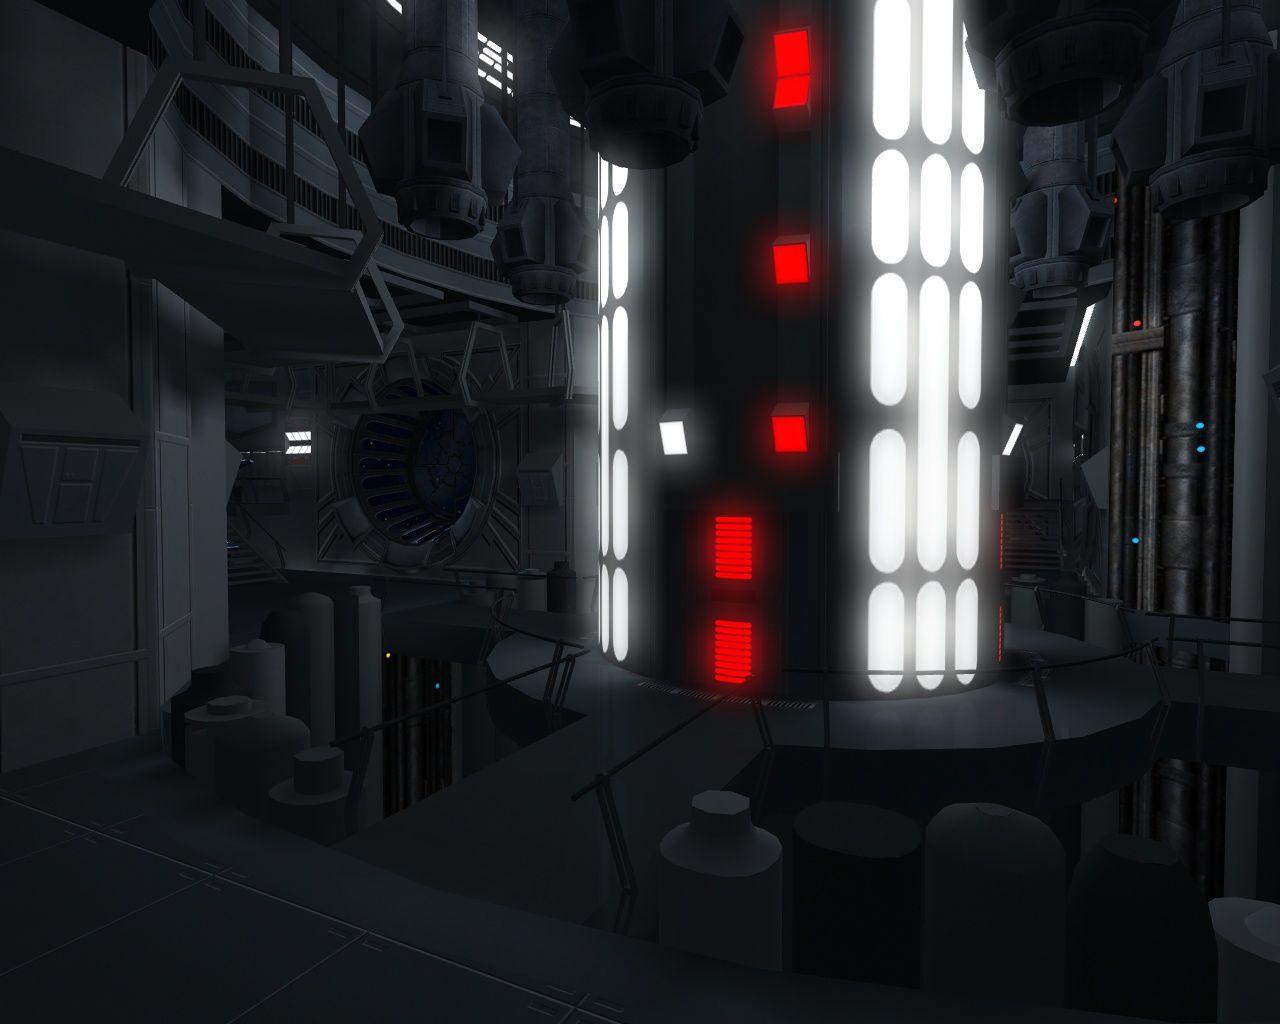 Death Star Board Room